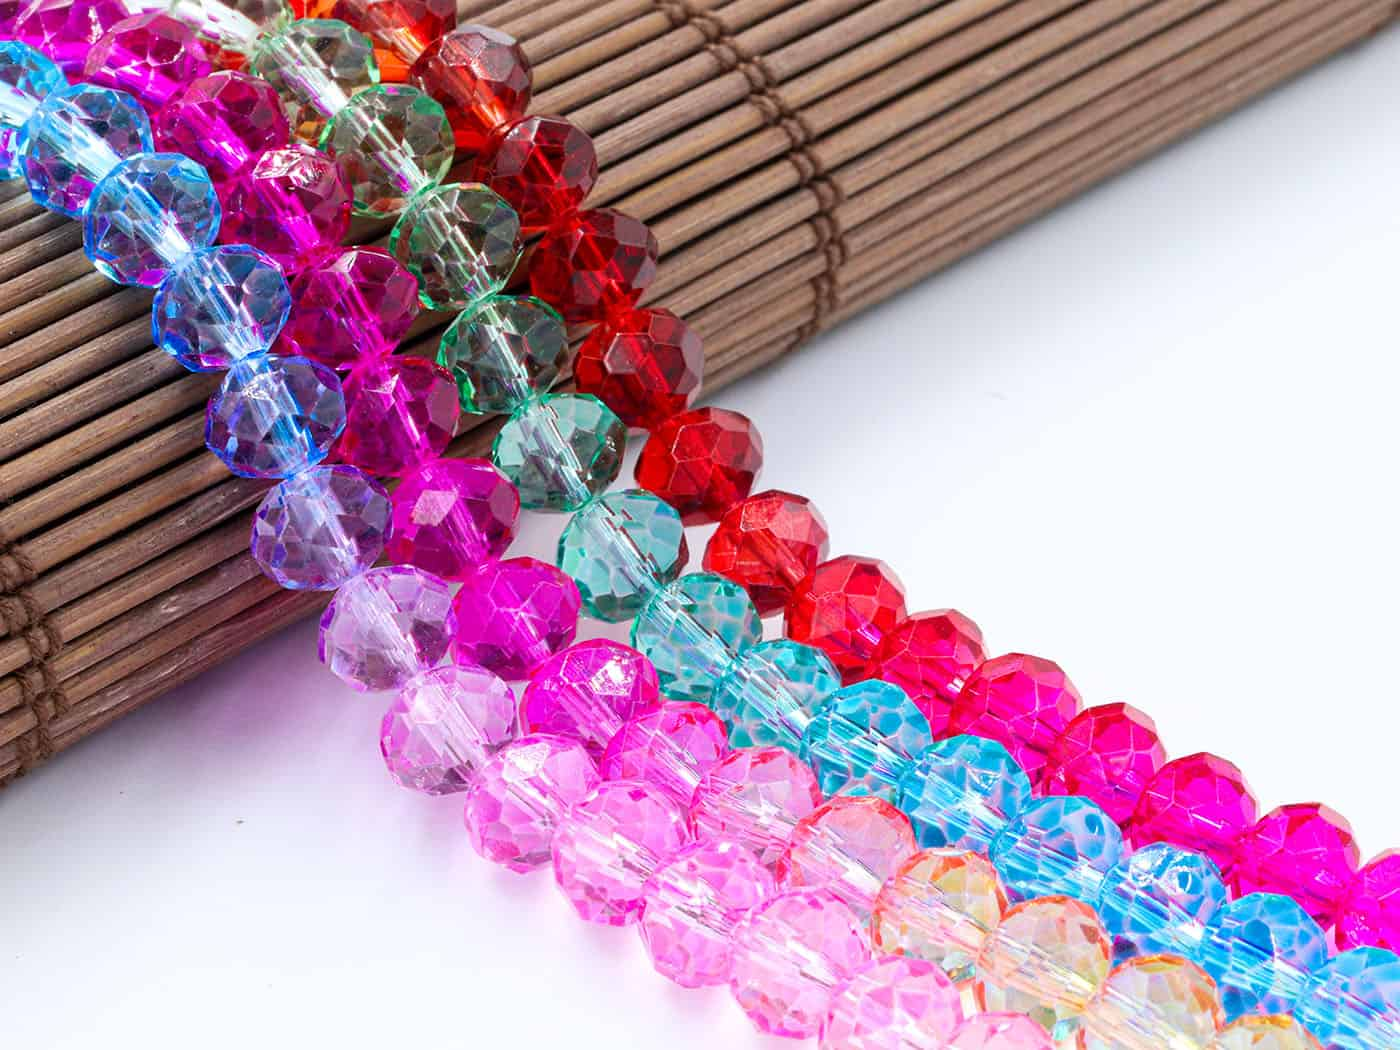 Cristal de Vidro Tie Dye Intense 6mm - 90 cristais - CV517  - ArtStones